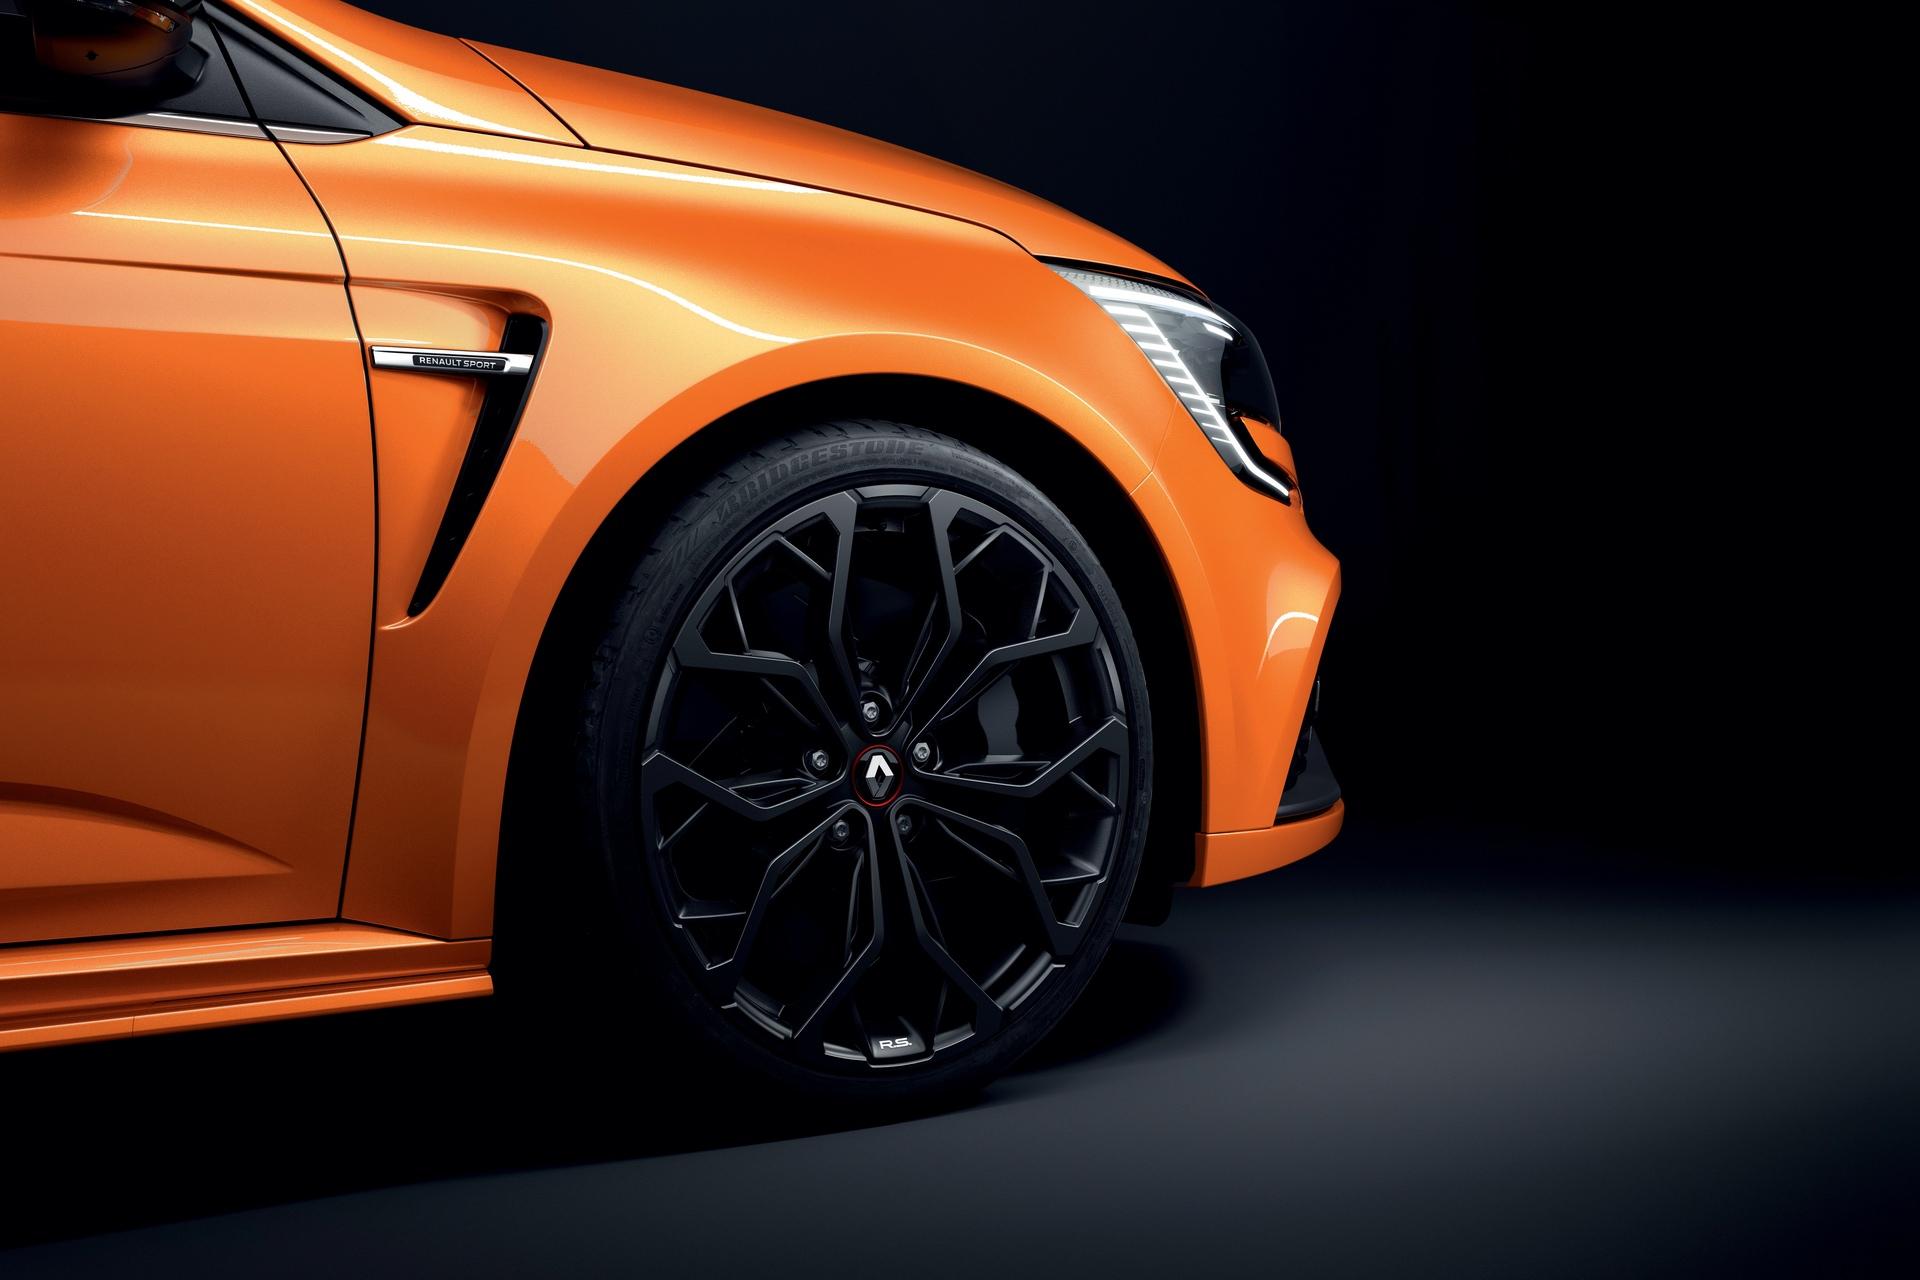 2020 - Nouvelle Renault MEGANE R.S.